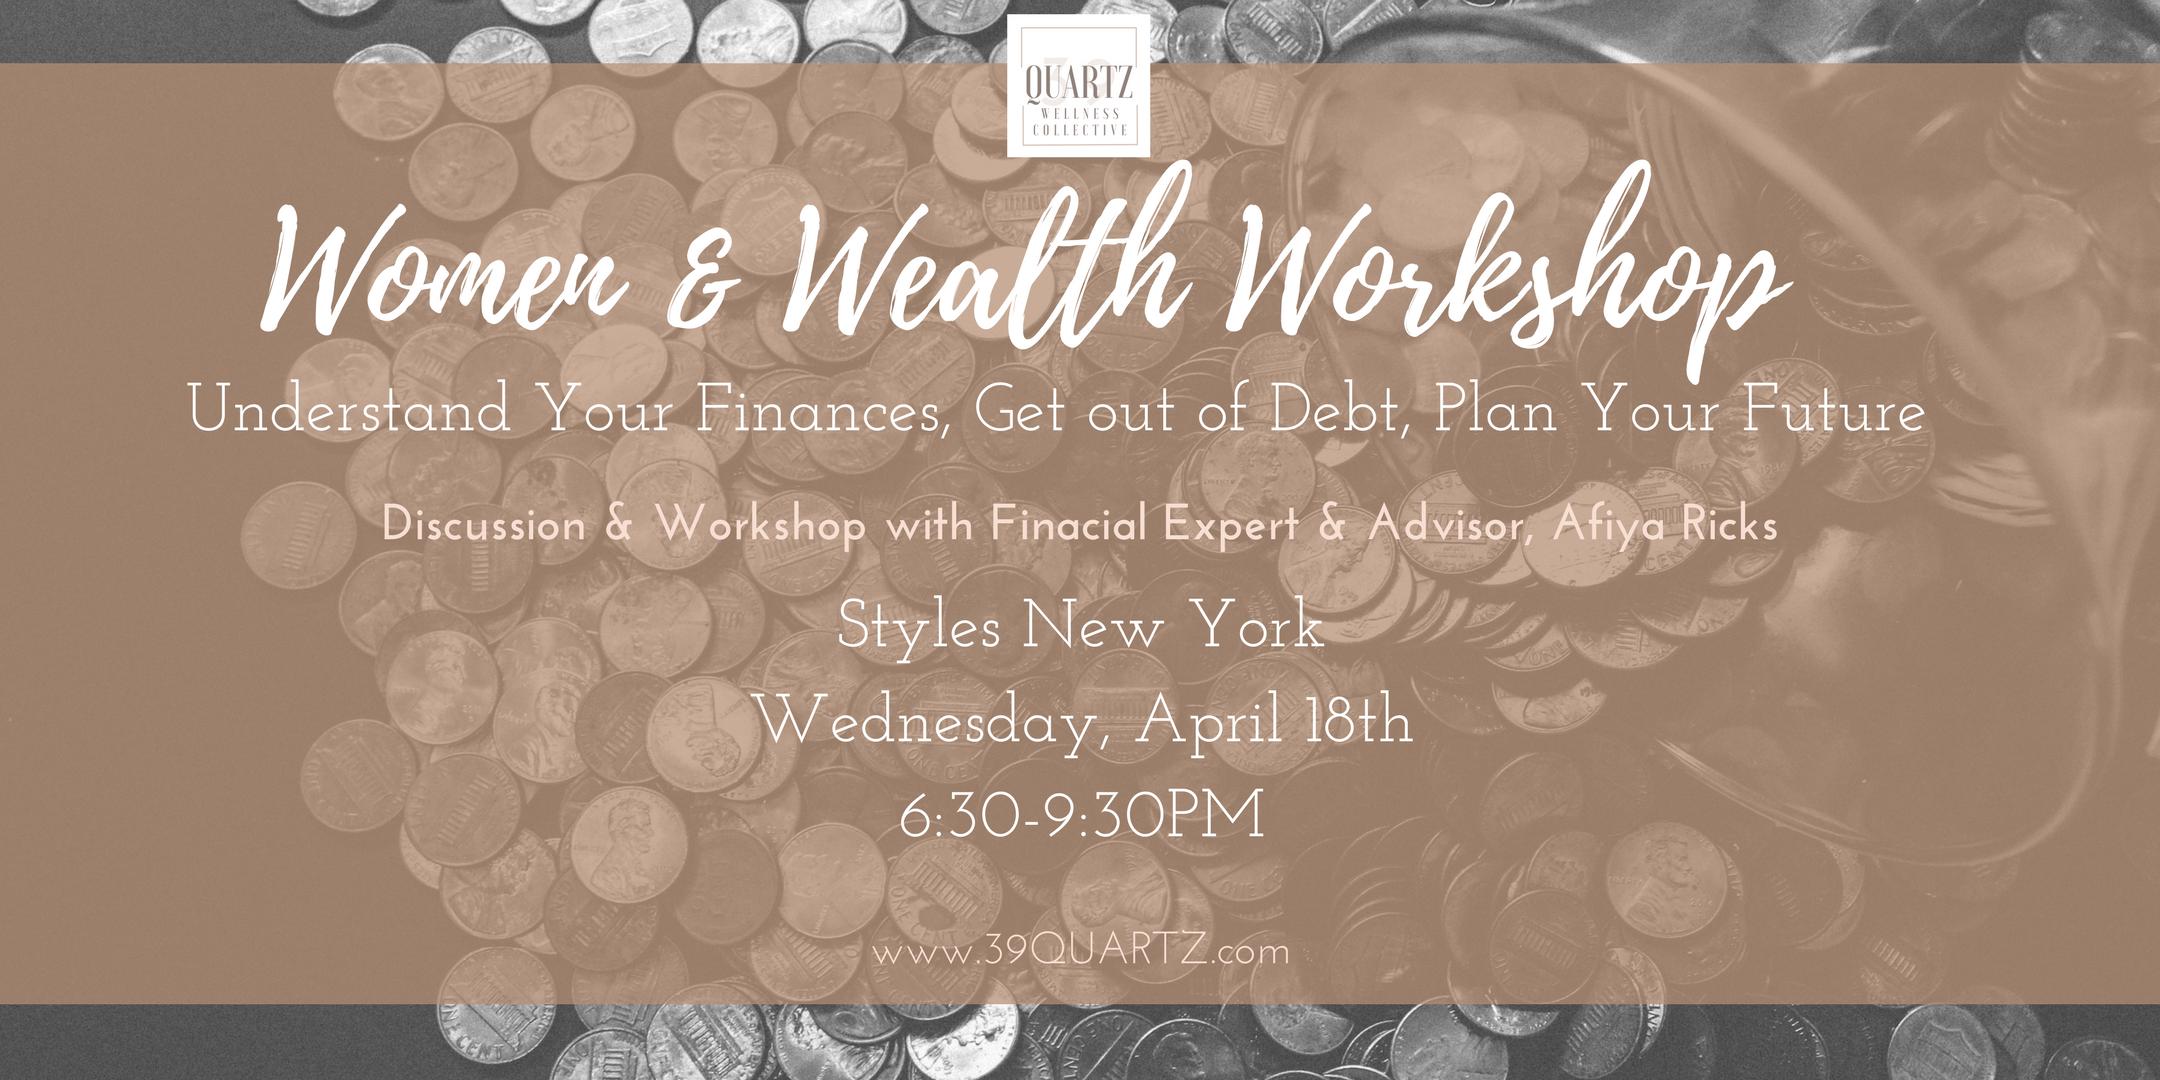 Women & Wealth Workshop 418 .png